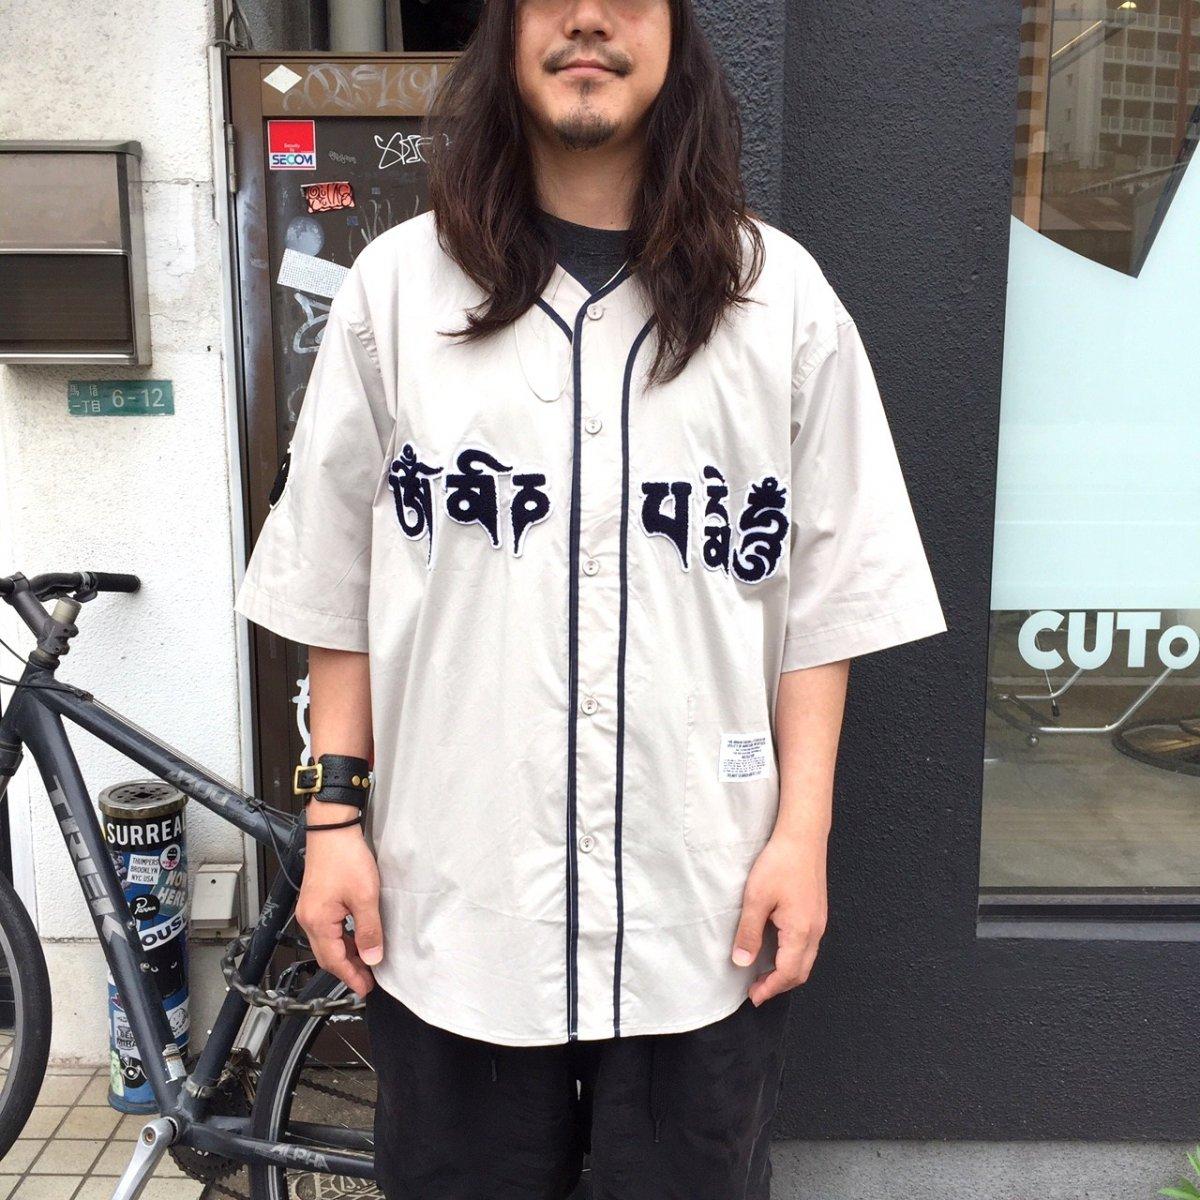 <img class='new_mark_img1' src='https://img.shop-pro.jp/img/new/icons24.gif' style='border:none;display:inline;margin:0px;padding:0px;width:auto;' />【SALE / 30%OFF】Black weirdos  ブラック ウィドー / シャツ Mantra Baseball Shirt 【GRAY】